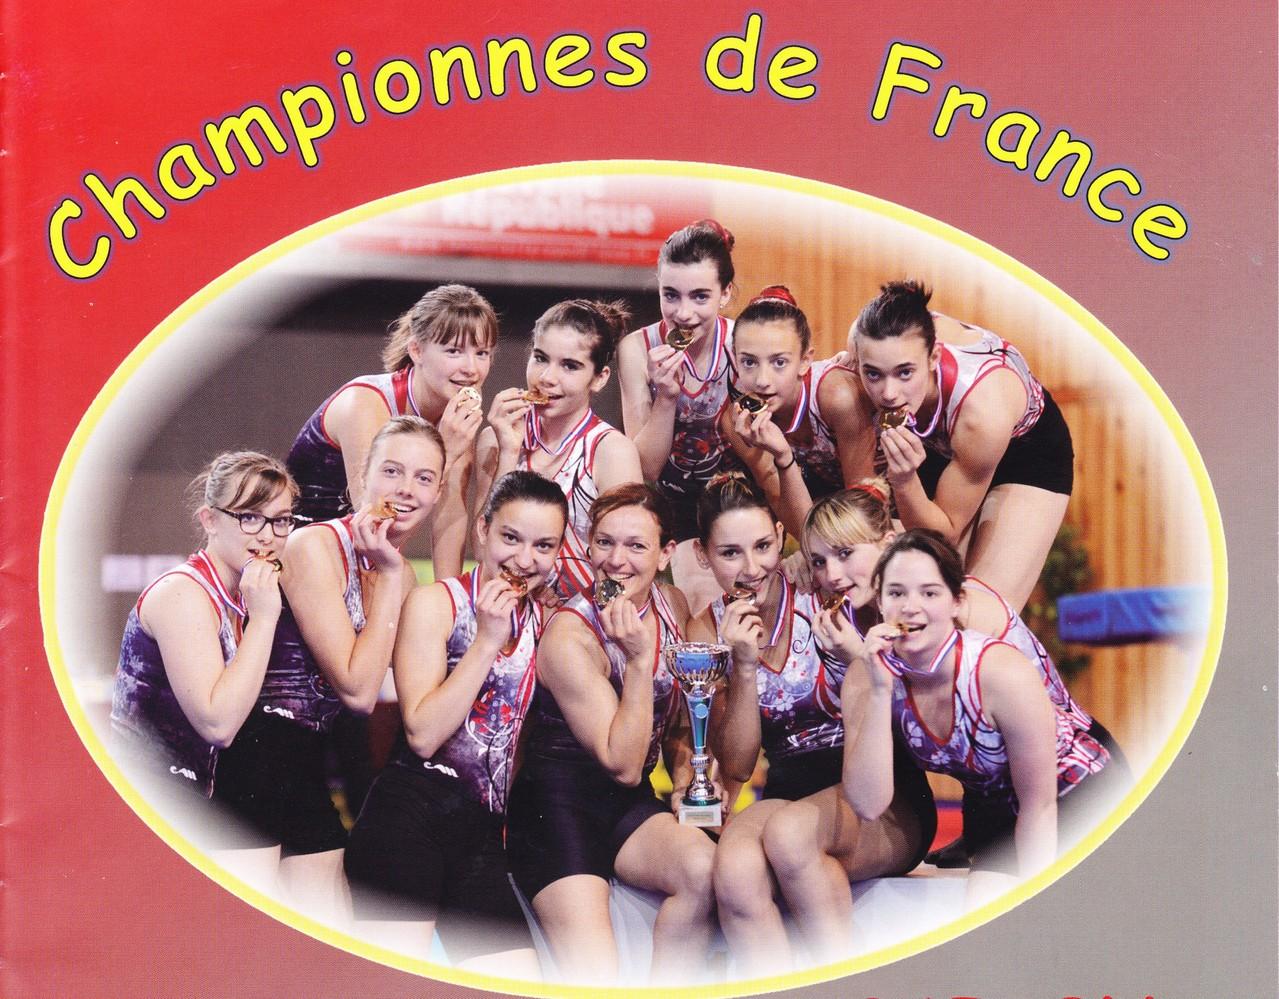 18 mai 2013 Médaille d'or de Team-Gym à Niort équipe féminine UGSP Portes-lès-Valence